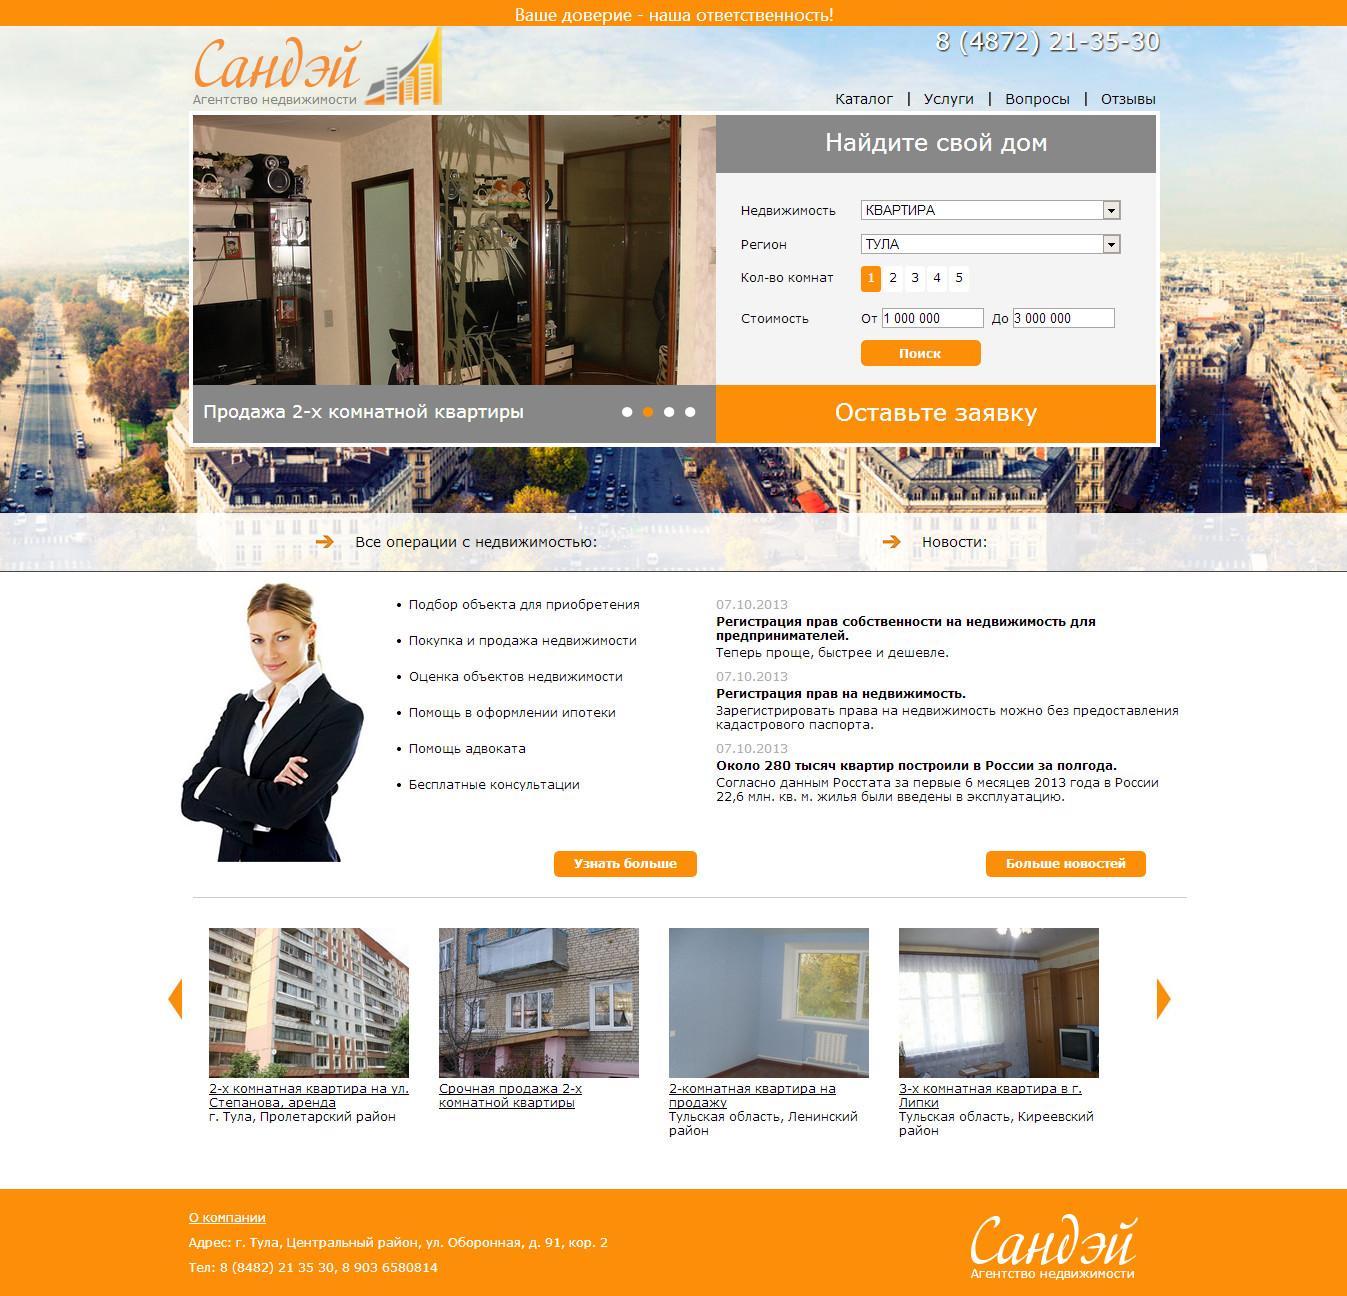 Сандэй - агентство недвижимости